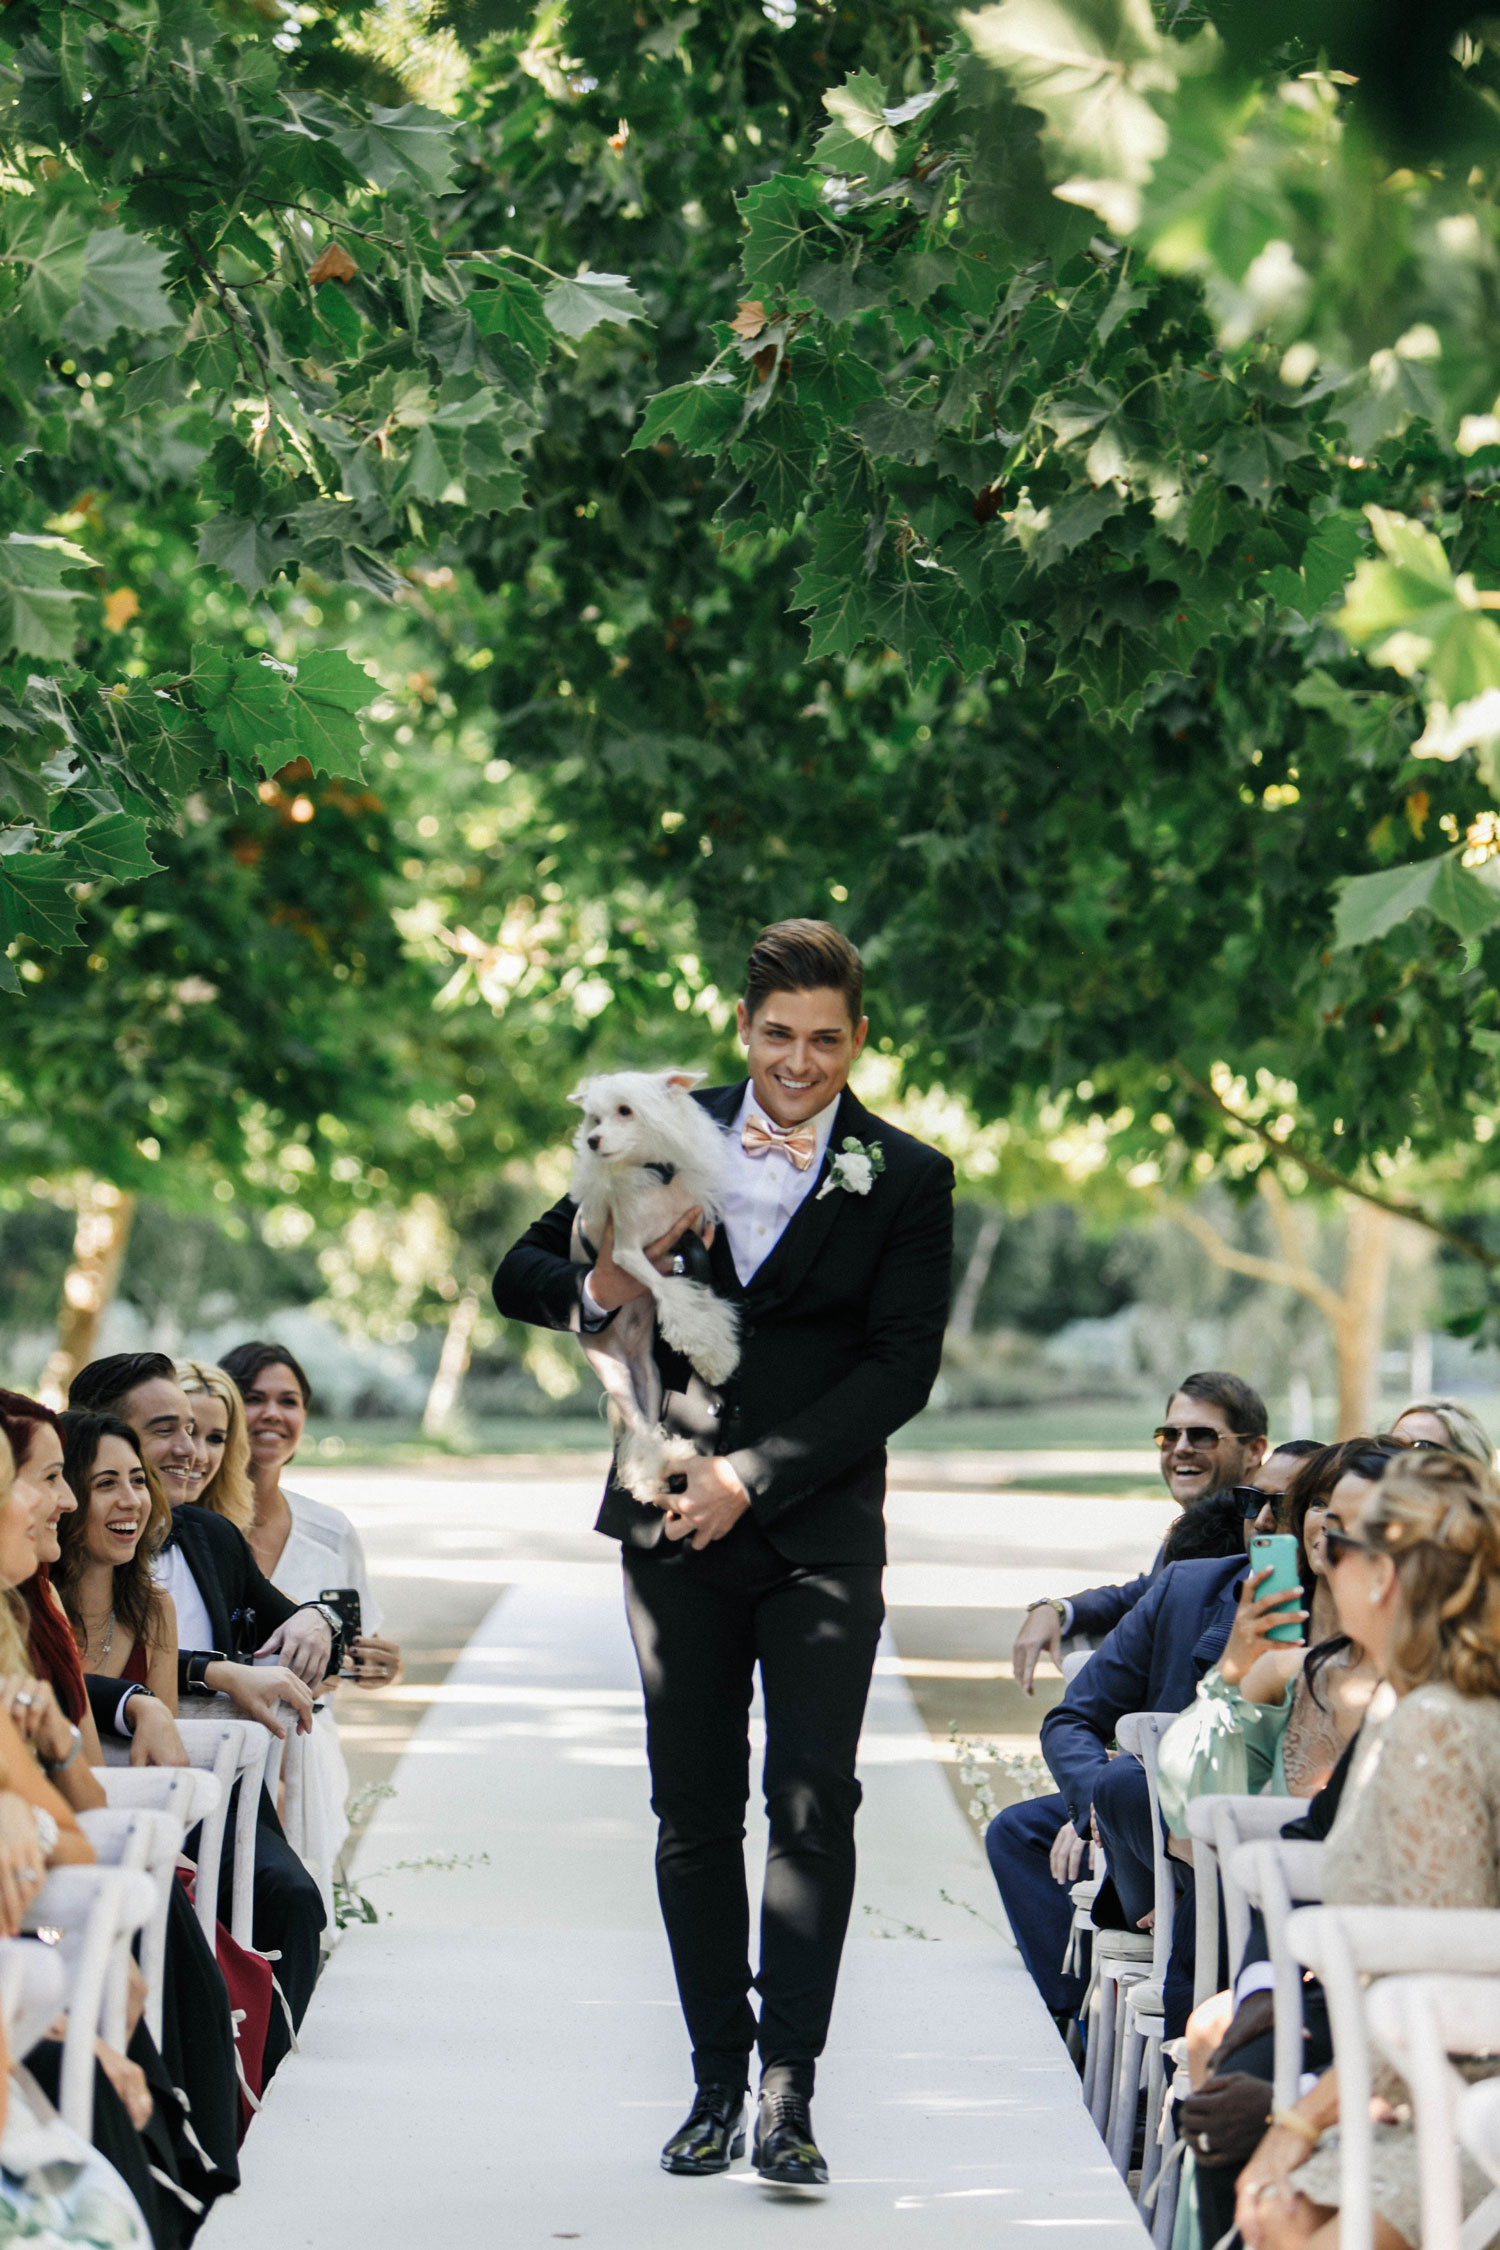 jillian murray and dean geyer wedding groomsman walking down aisle with dog